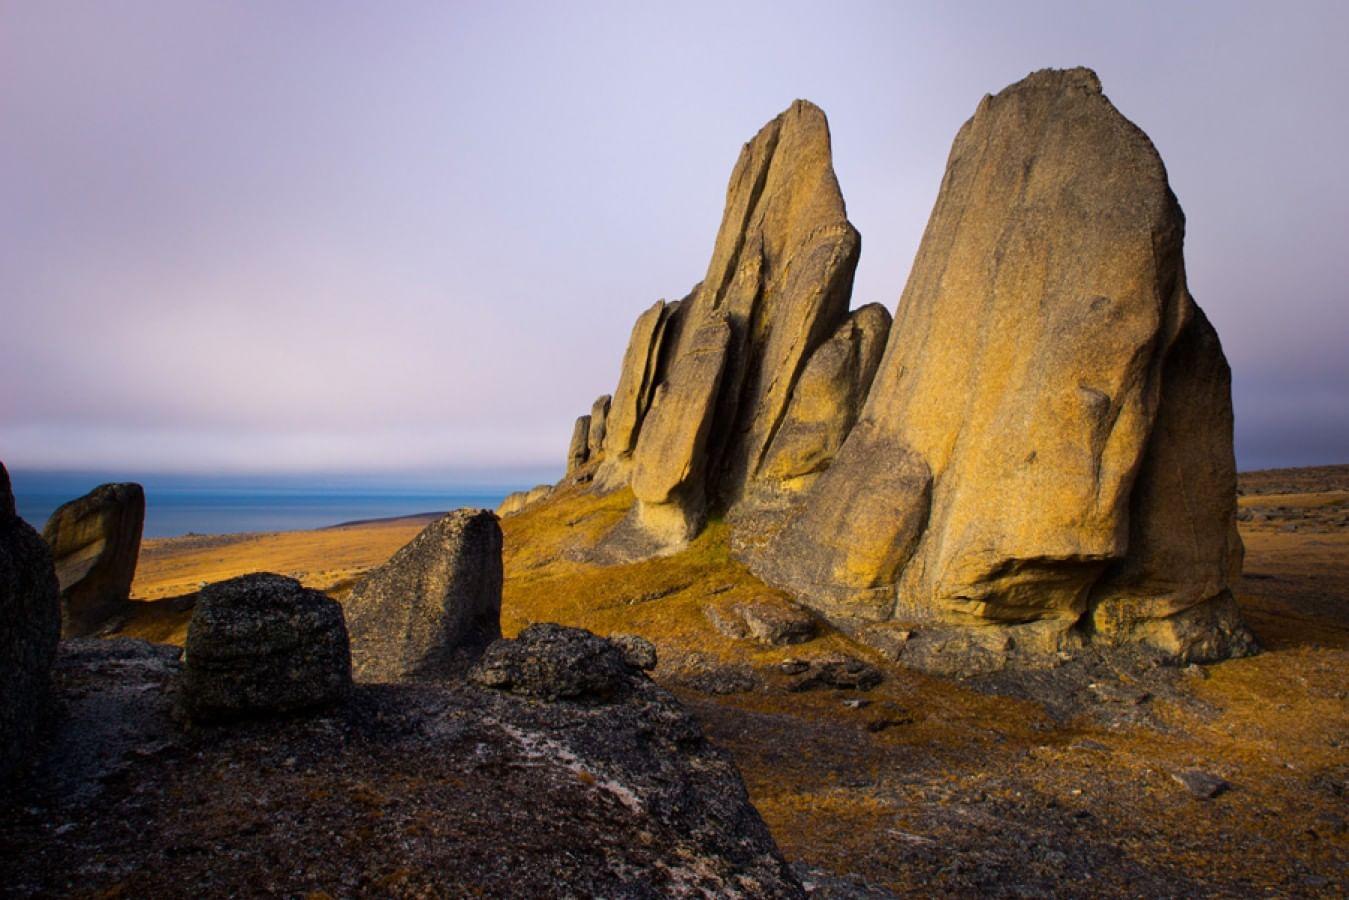 Якутские Кигиляхи в Республике Саха (Якутия)